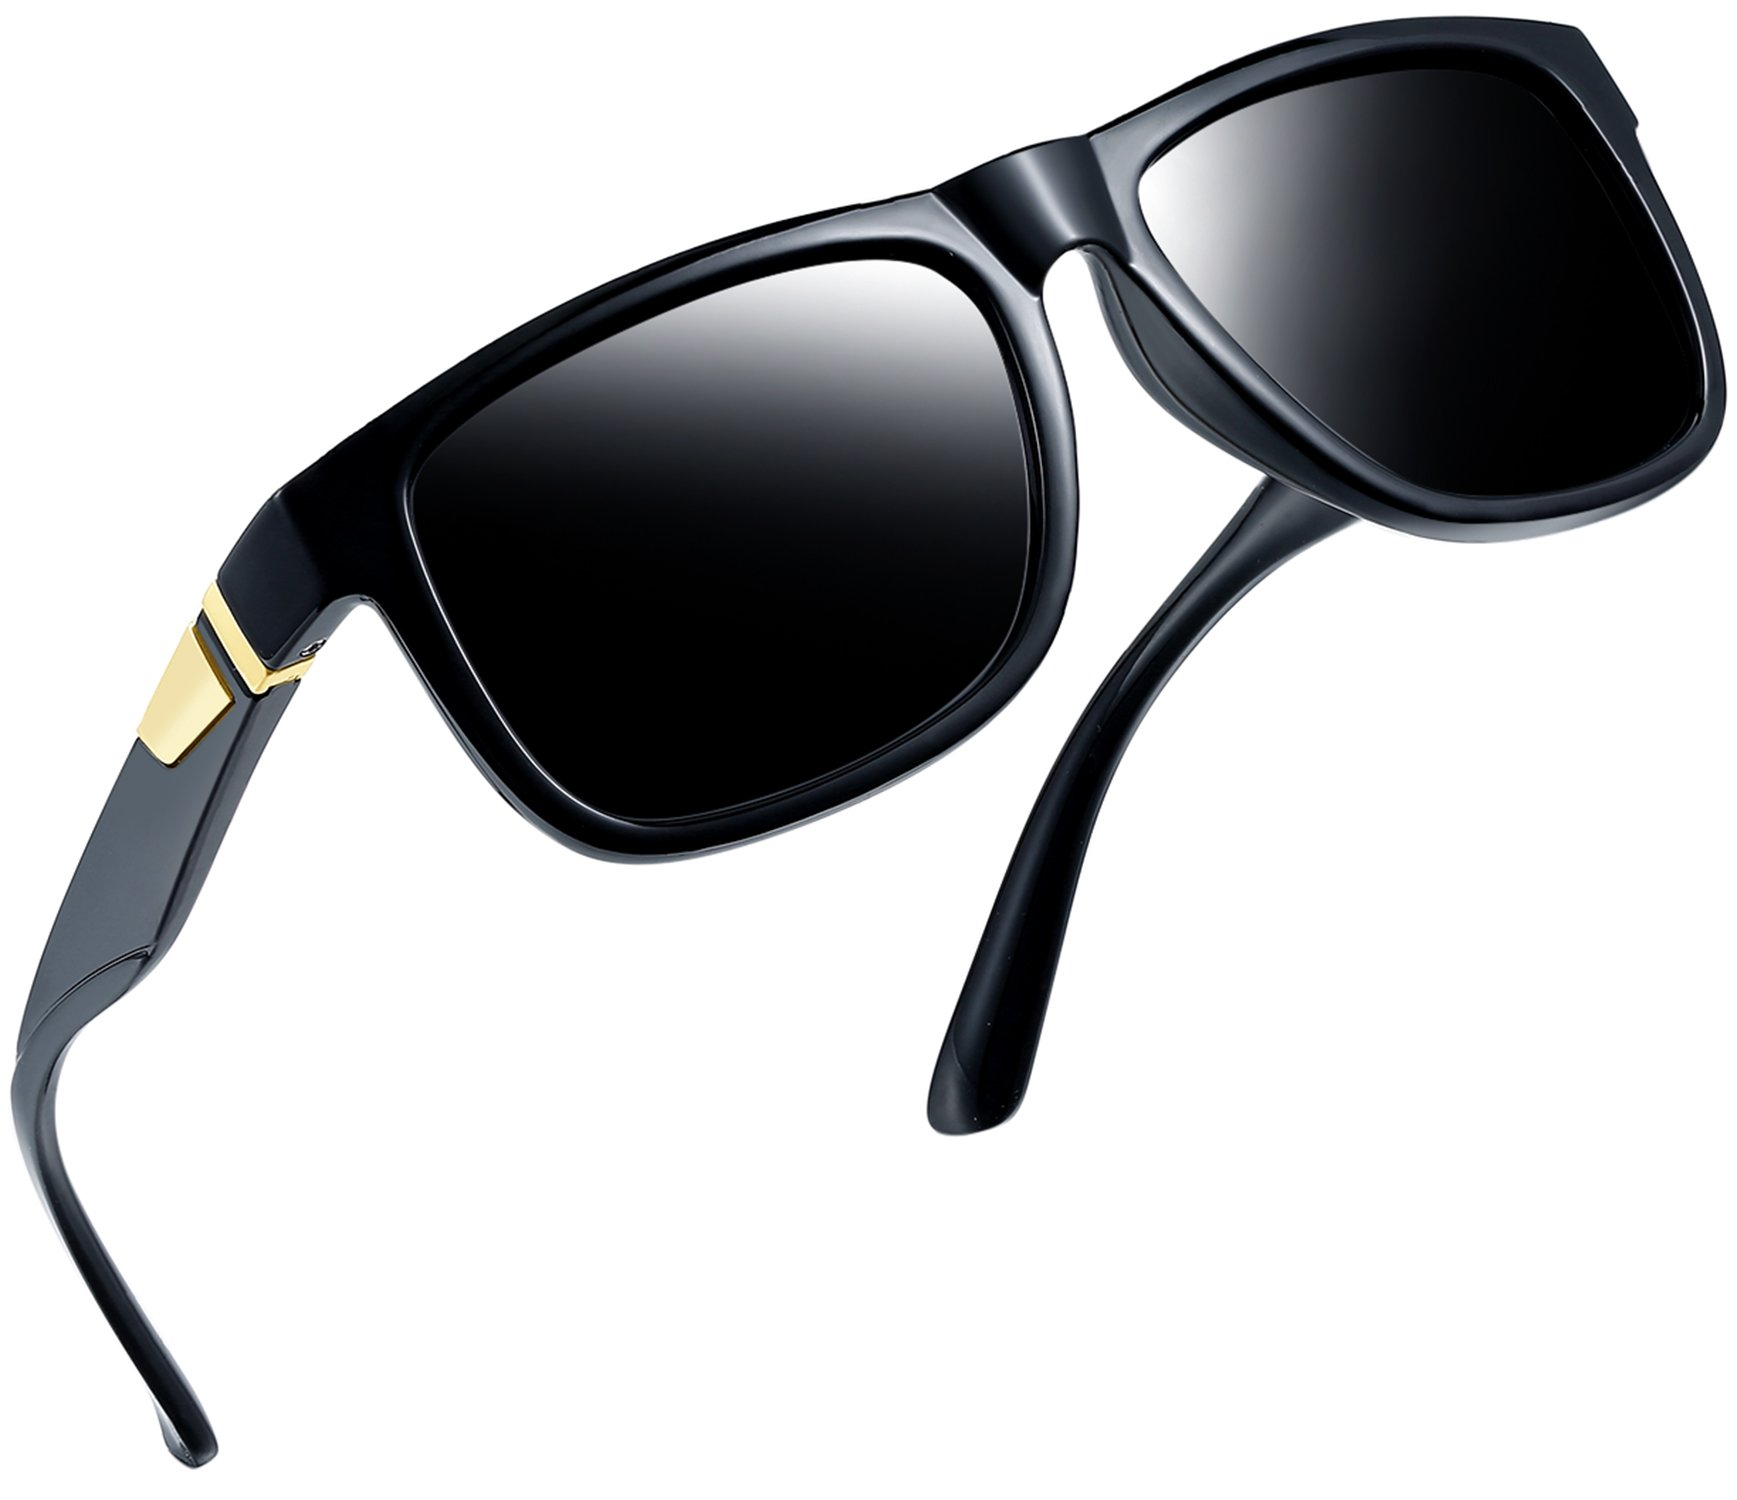 Joopin Unisex Polarized Sunglasses Classic Men Retro UV400 Sun glasses (Glossy Black Retro) by Joopin